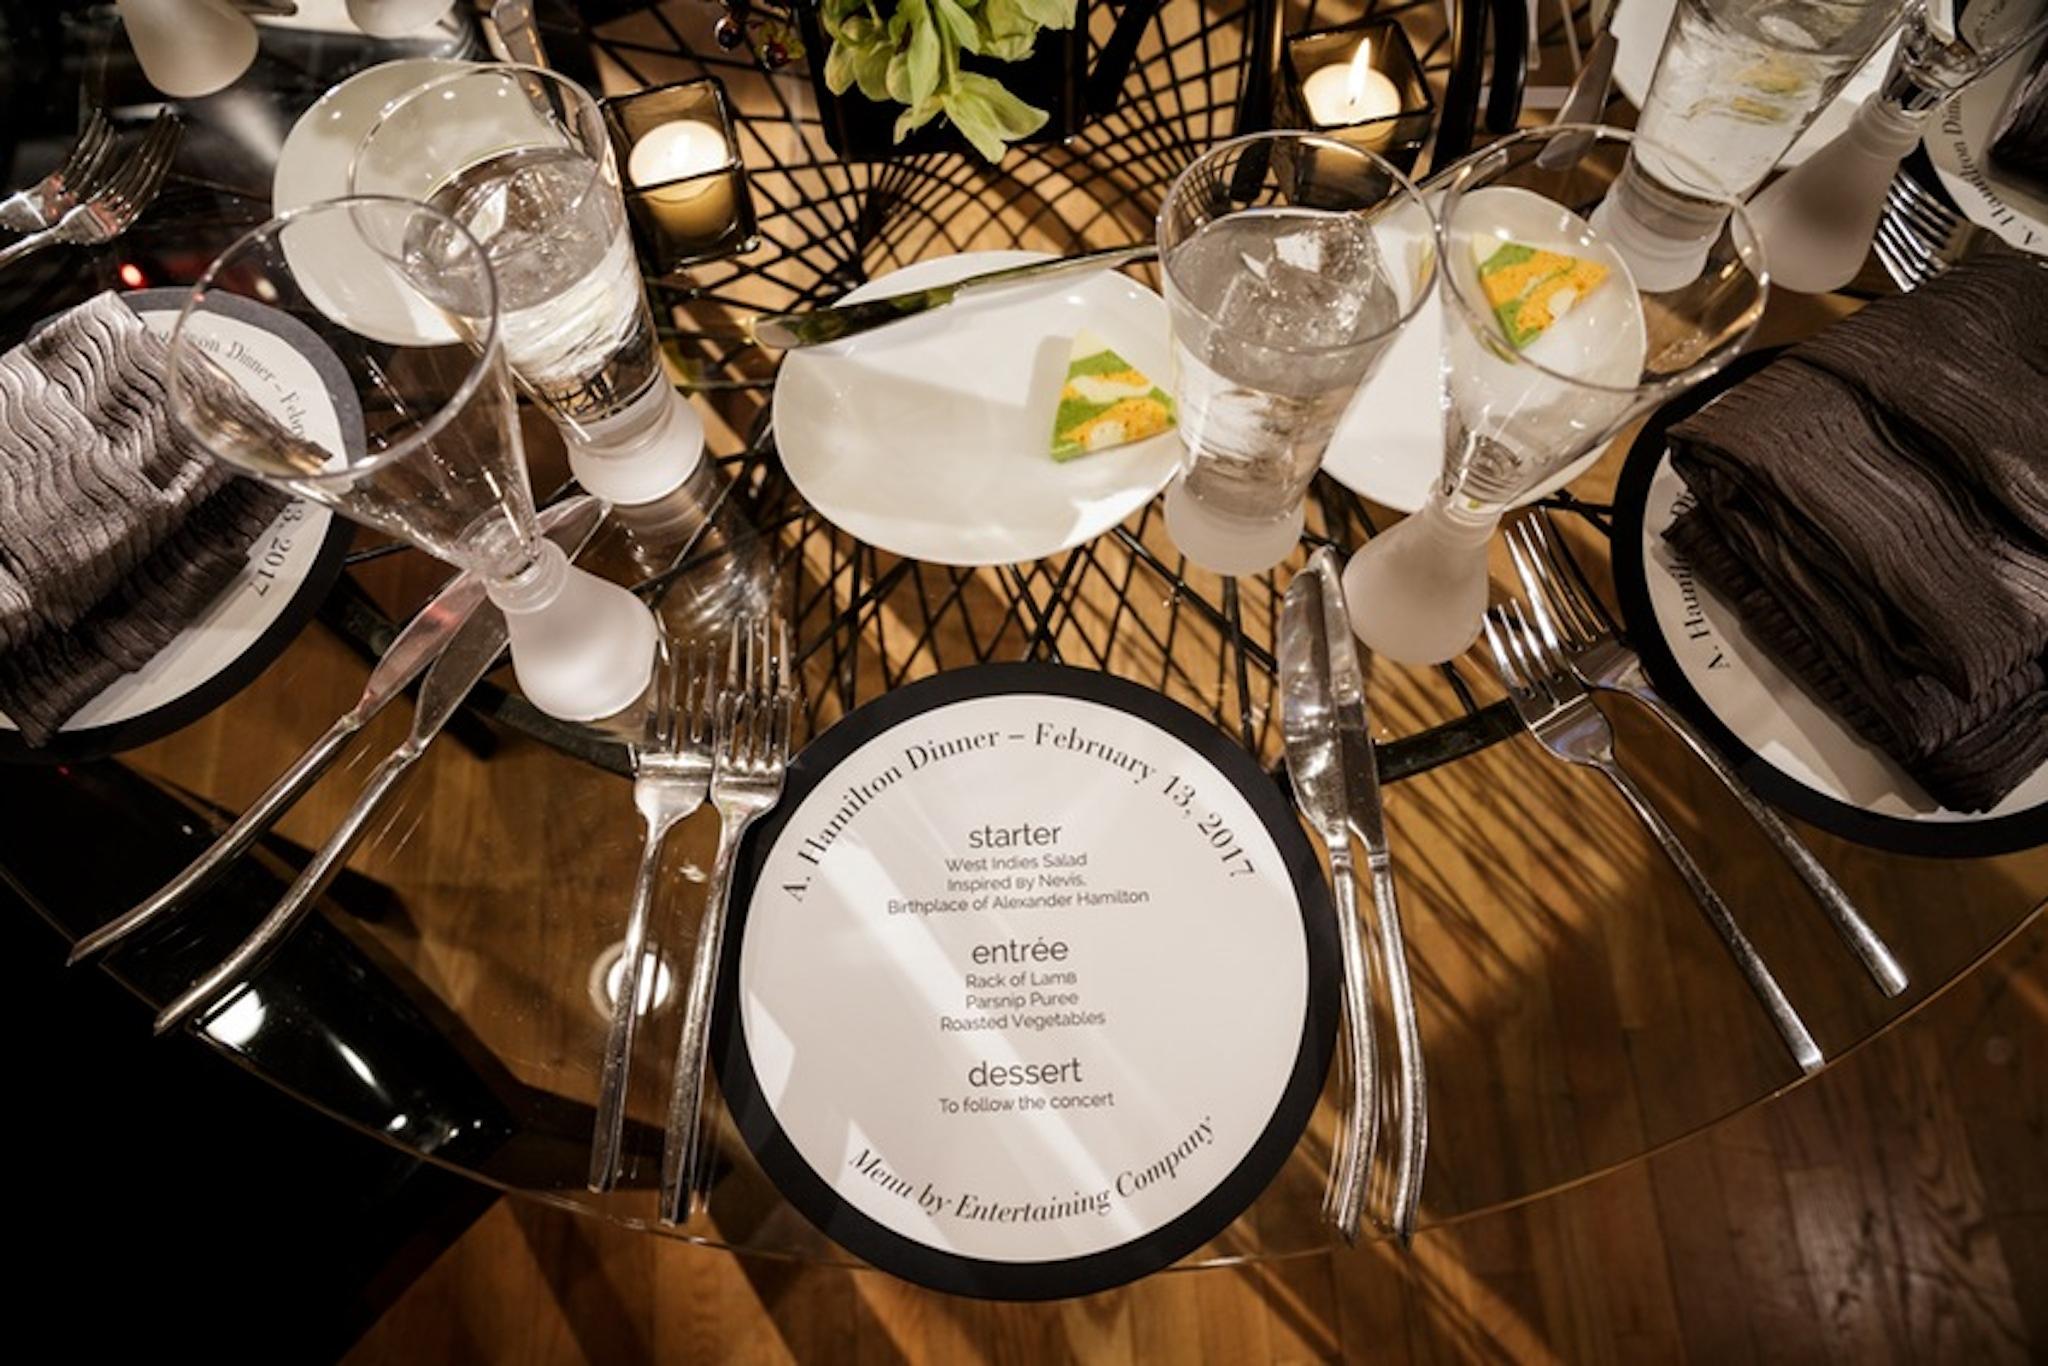 Dinner party menu ideas - Broadway's Hamilton Chicago